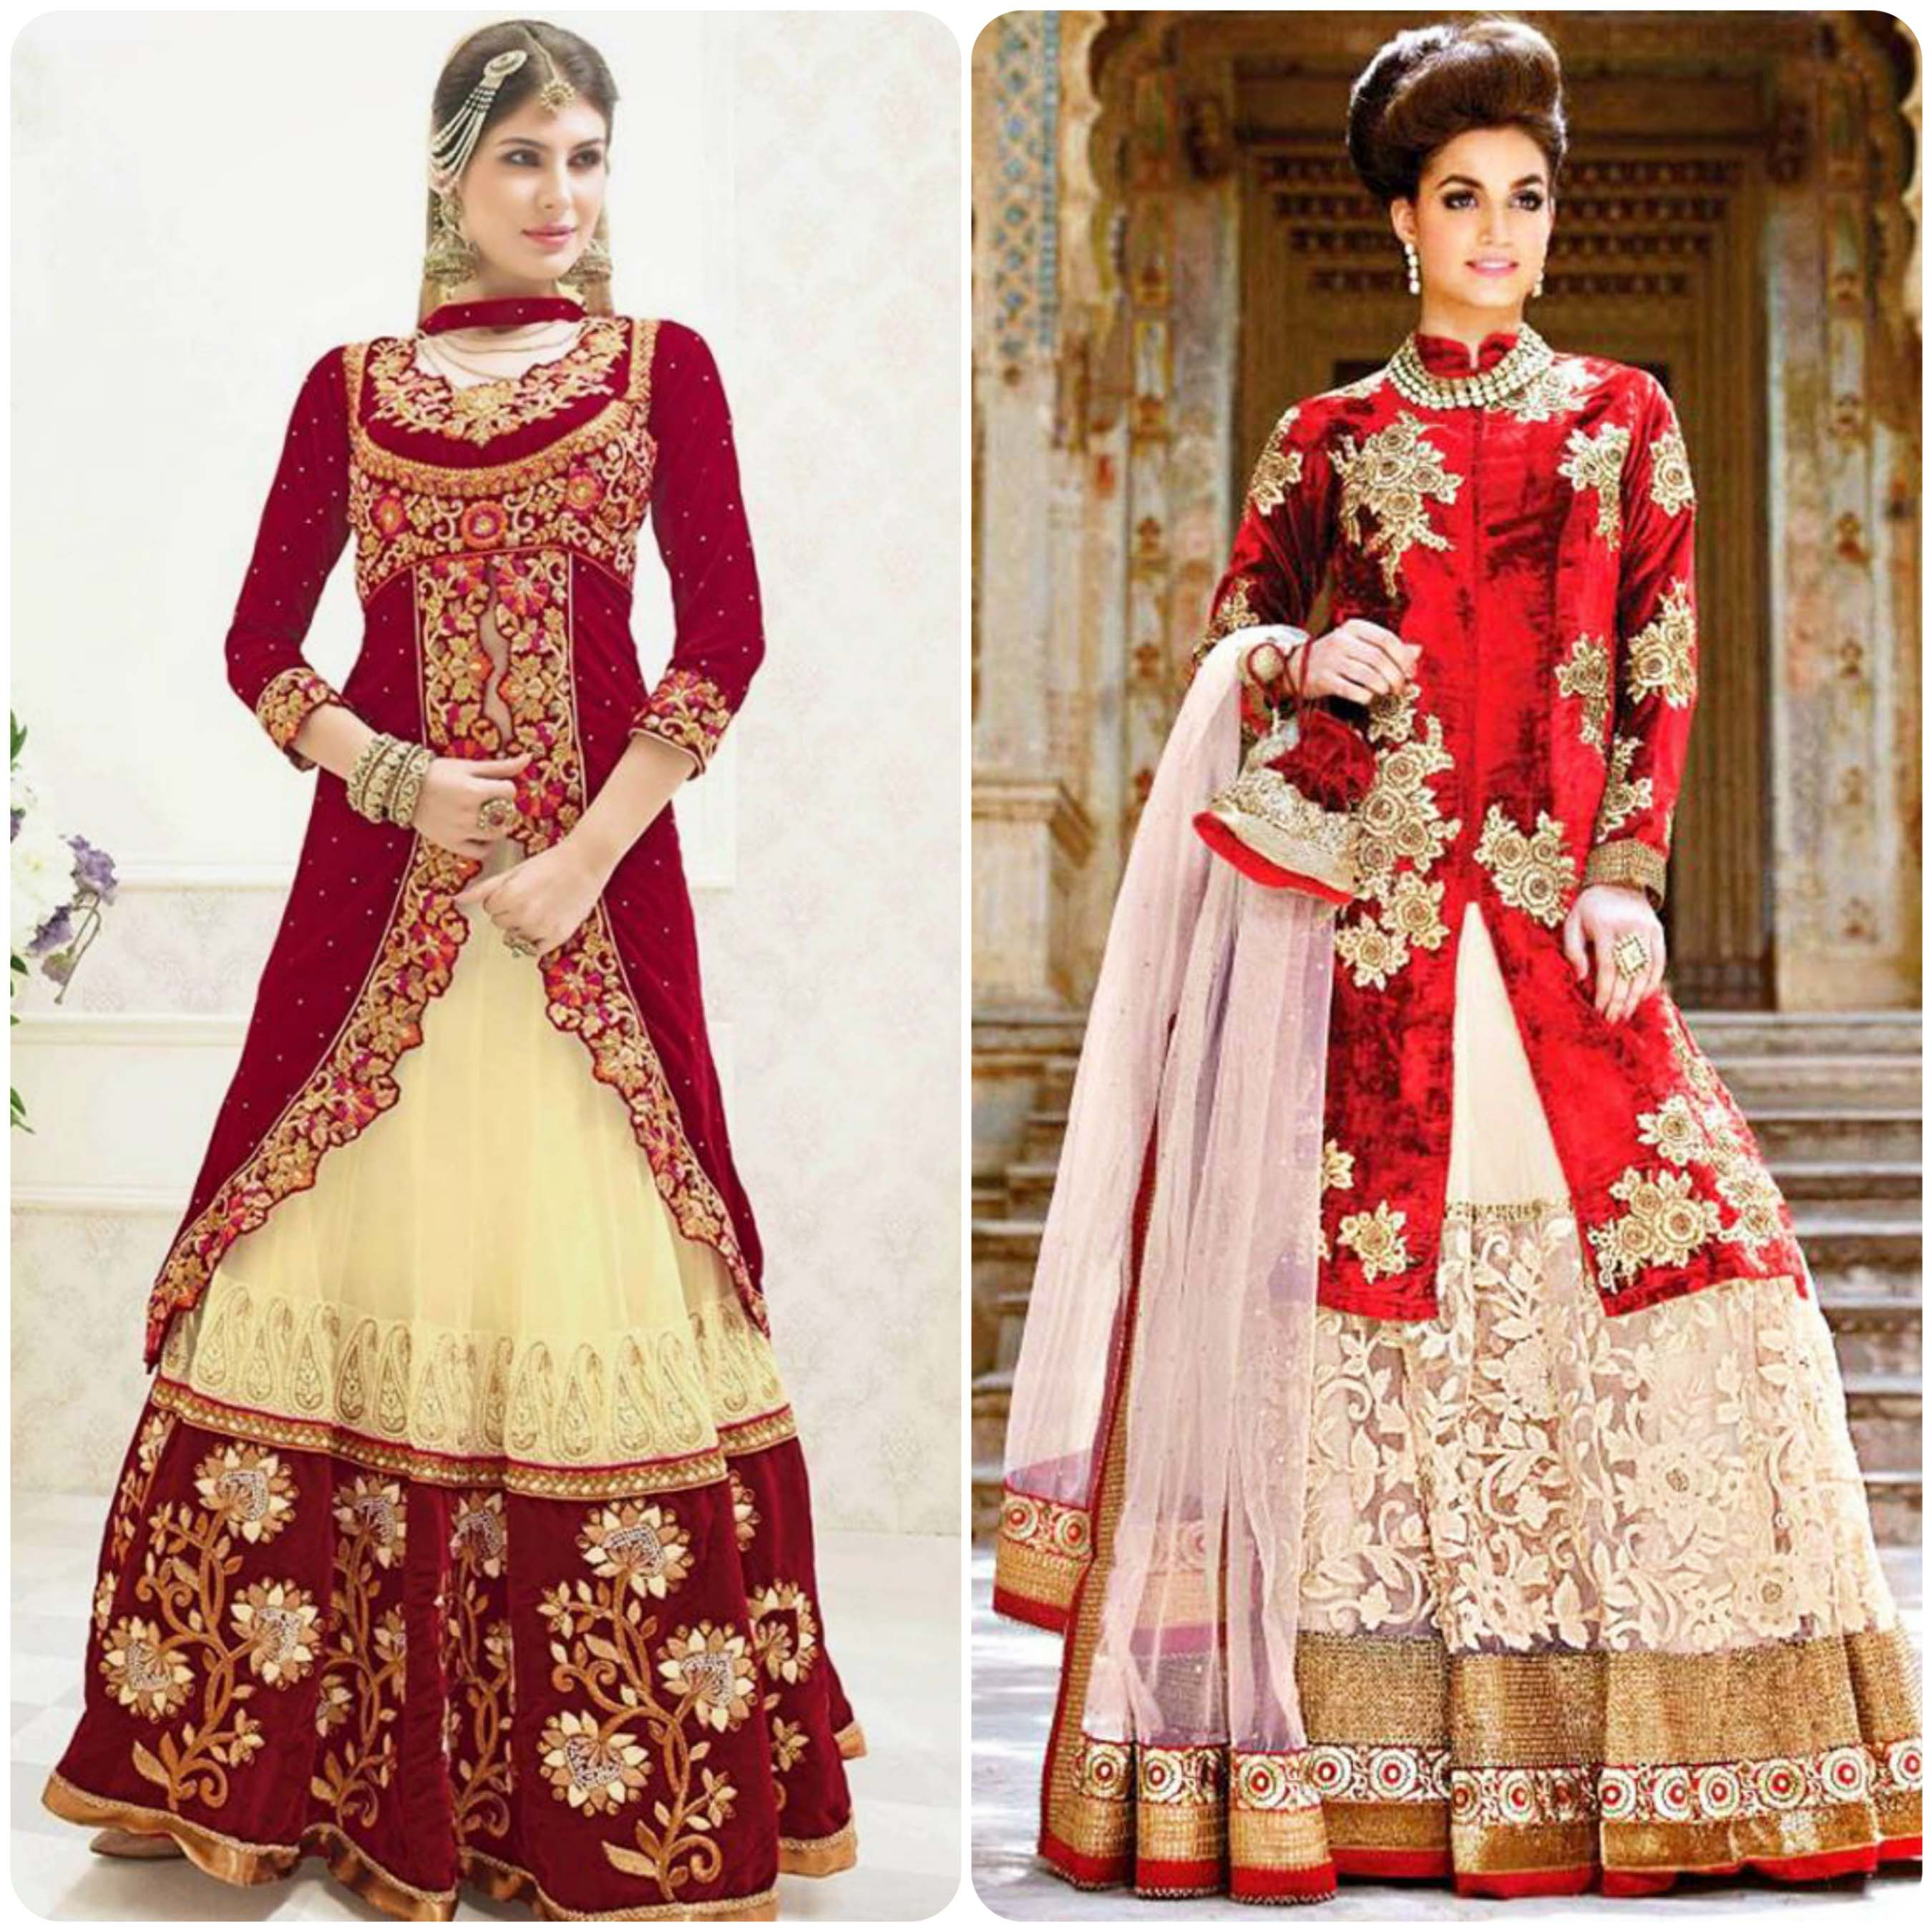 Best Designer Wedding Dress Collection for Brides 2016-2017 | Stylo ...